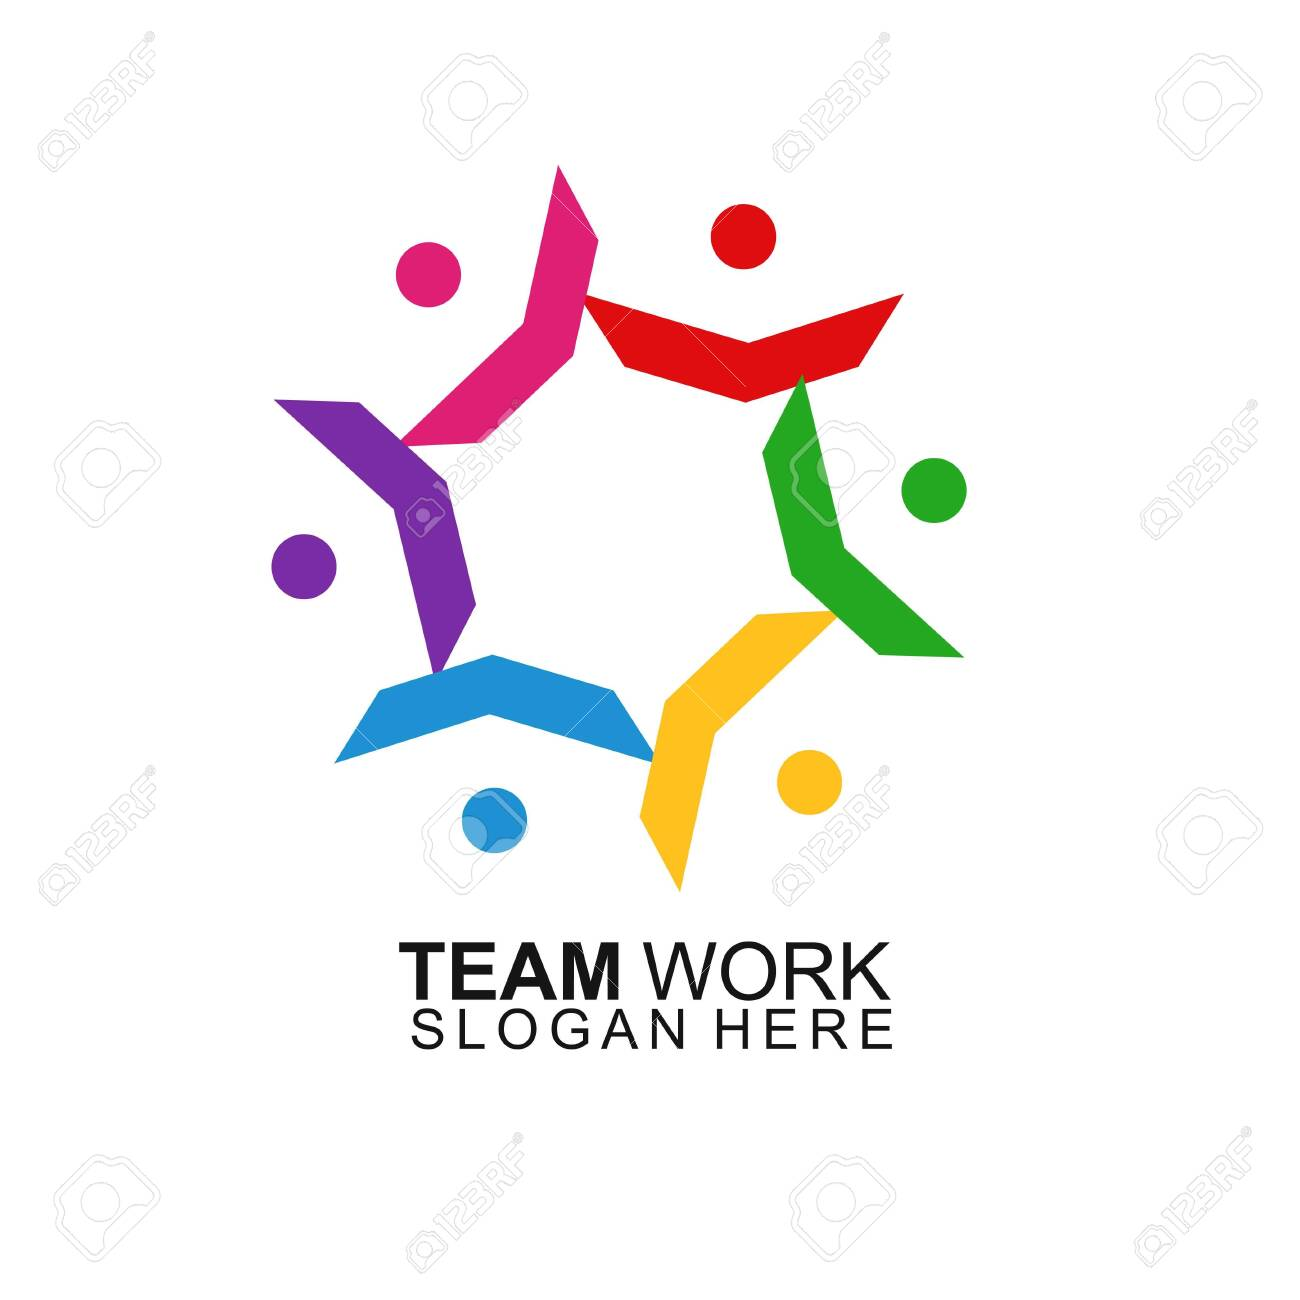 Team Work Logo Design. Modern Social Network Team Logo Design - 146612160